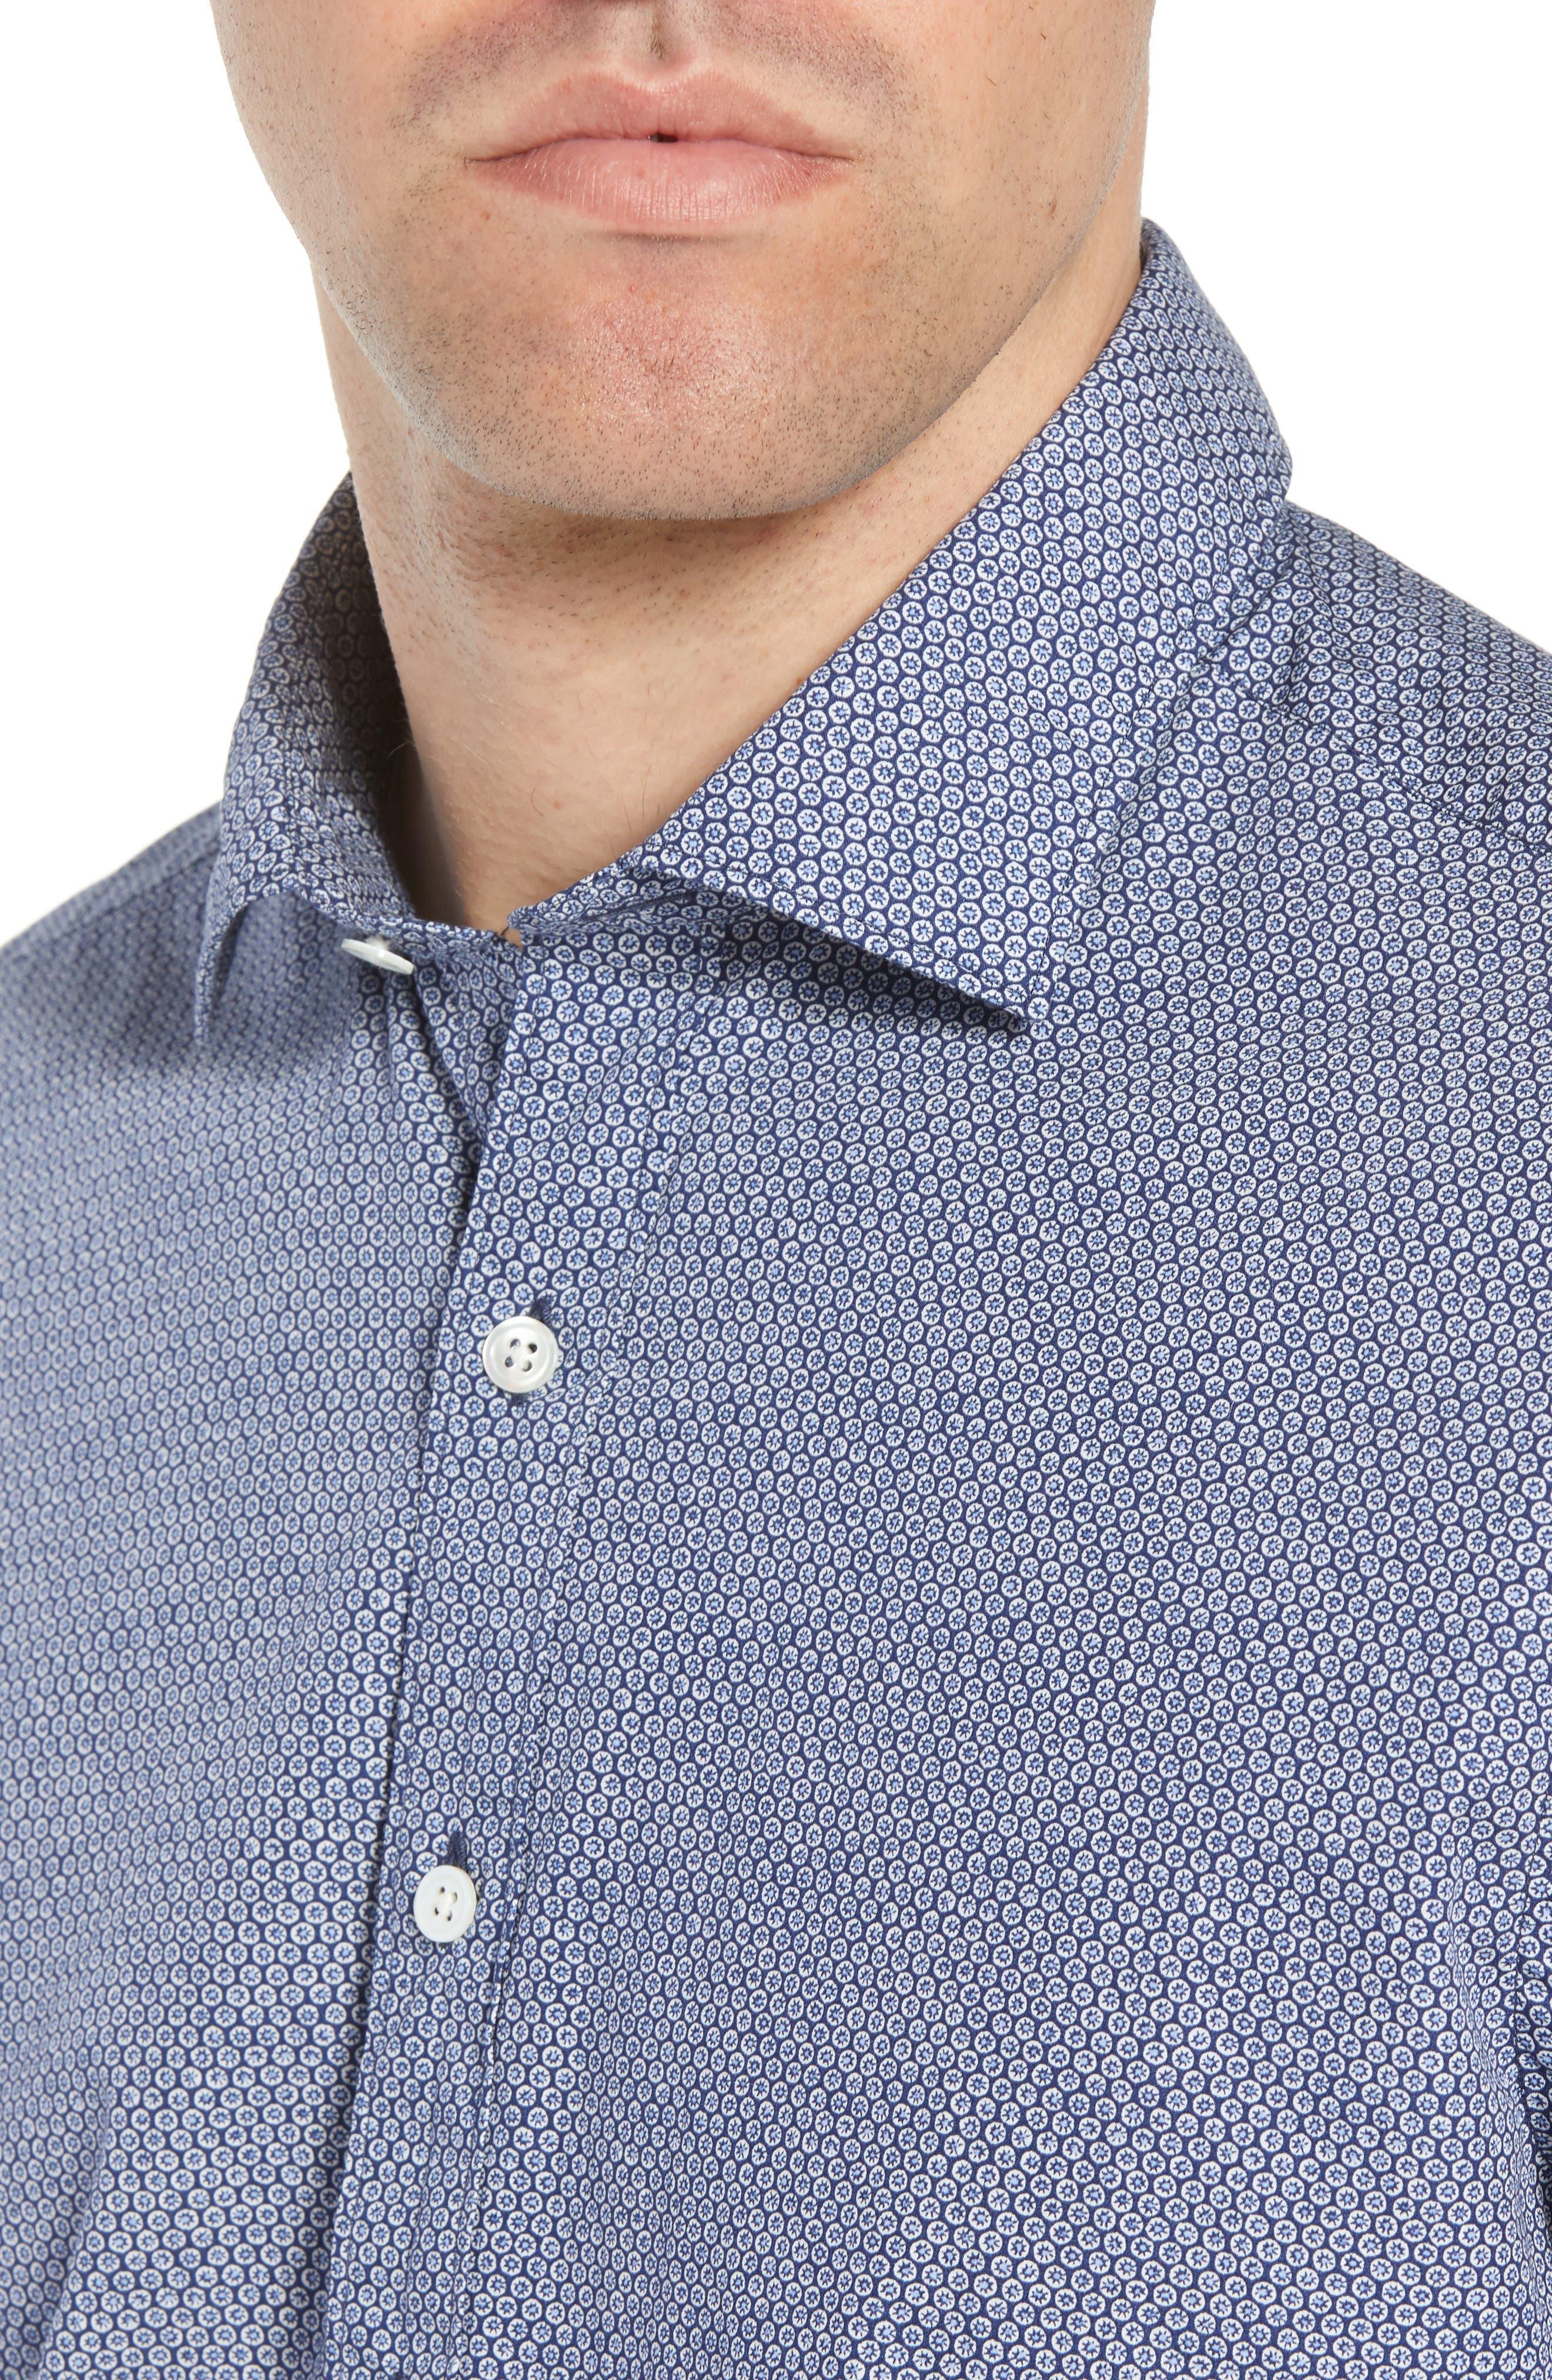 Beacon Point Regular Fit Sport Shirt,                             Alternate thumbnail 2, color,                             Navy